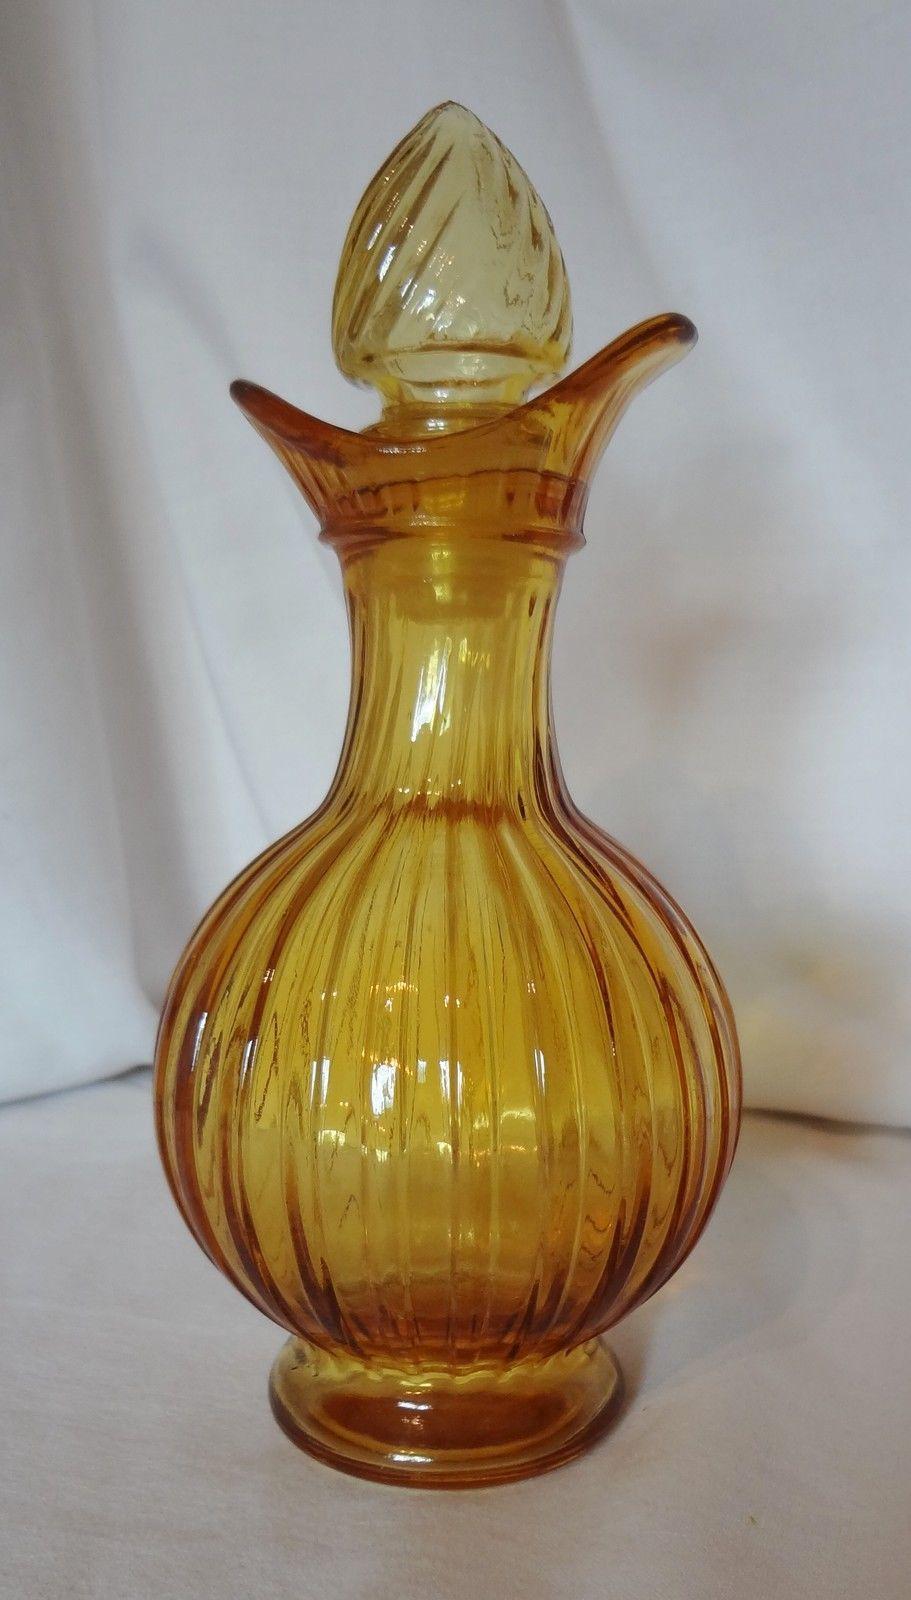 avon amber ribbed cruet glass decanter bottle with glass stopper bottles. Black Bedroom Furniture Sets. Home Design Ideas